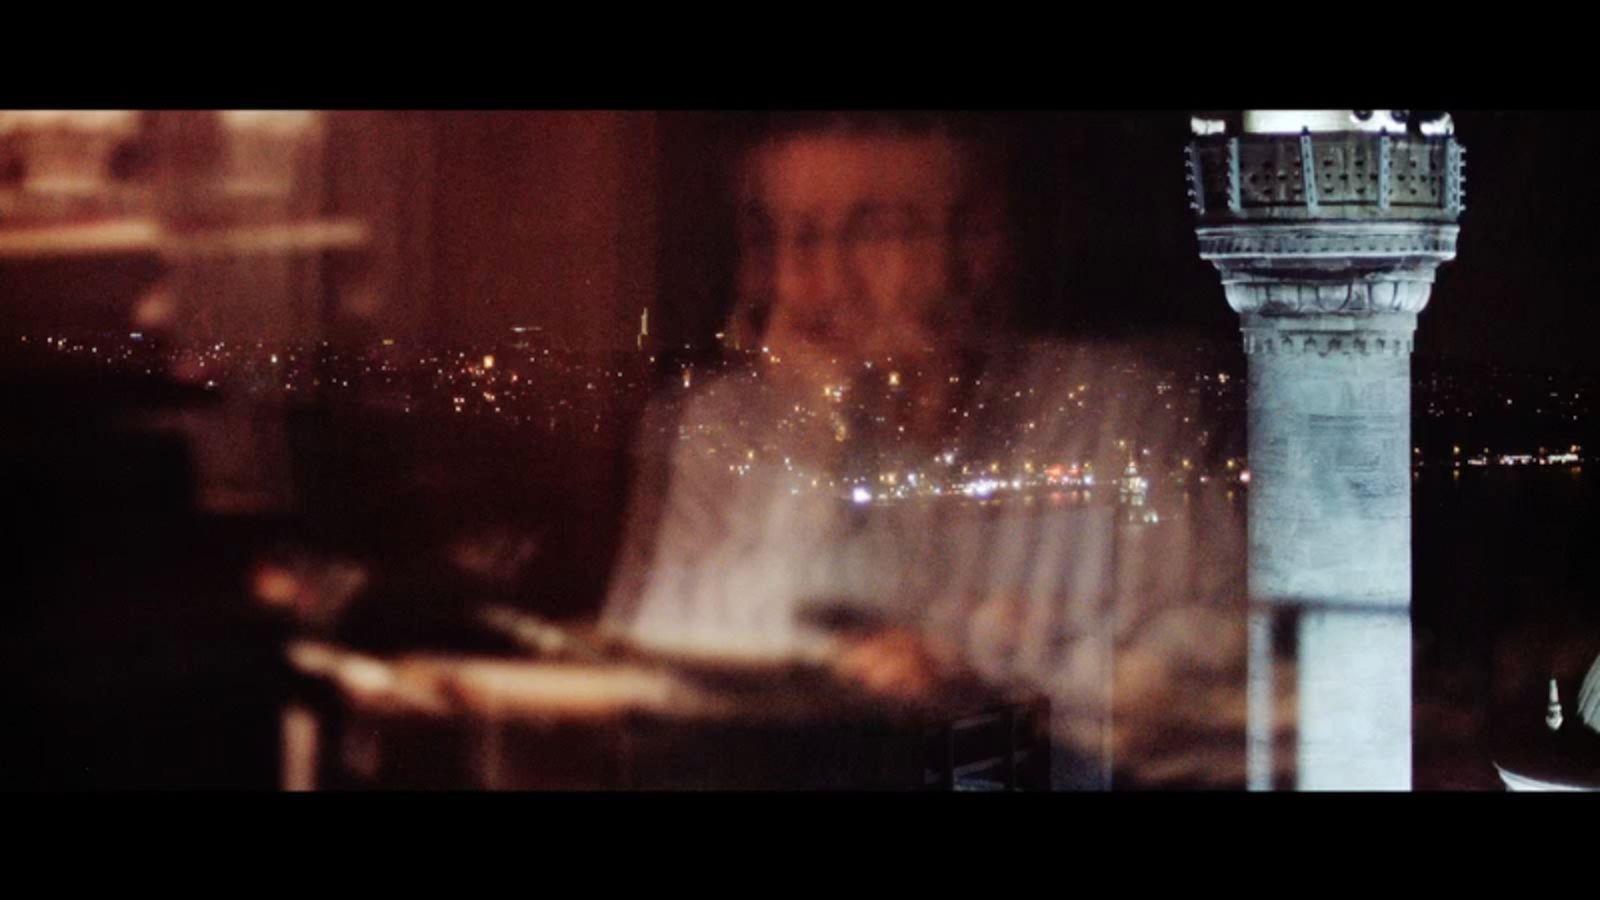 Innocence of Memories - Orhan Pamuk's Museum and Istanbul: una suggestiva immagine tratta dal documentario